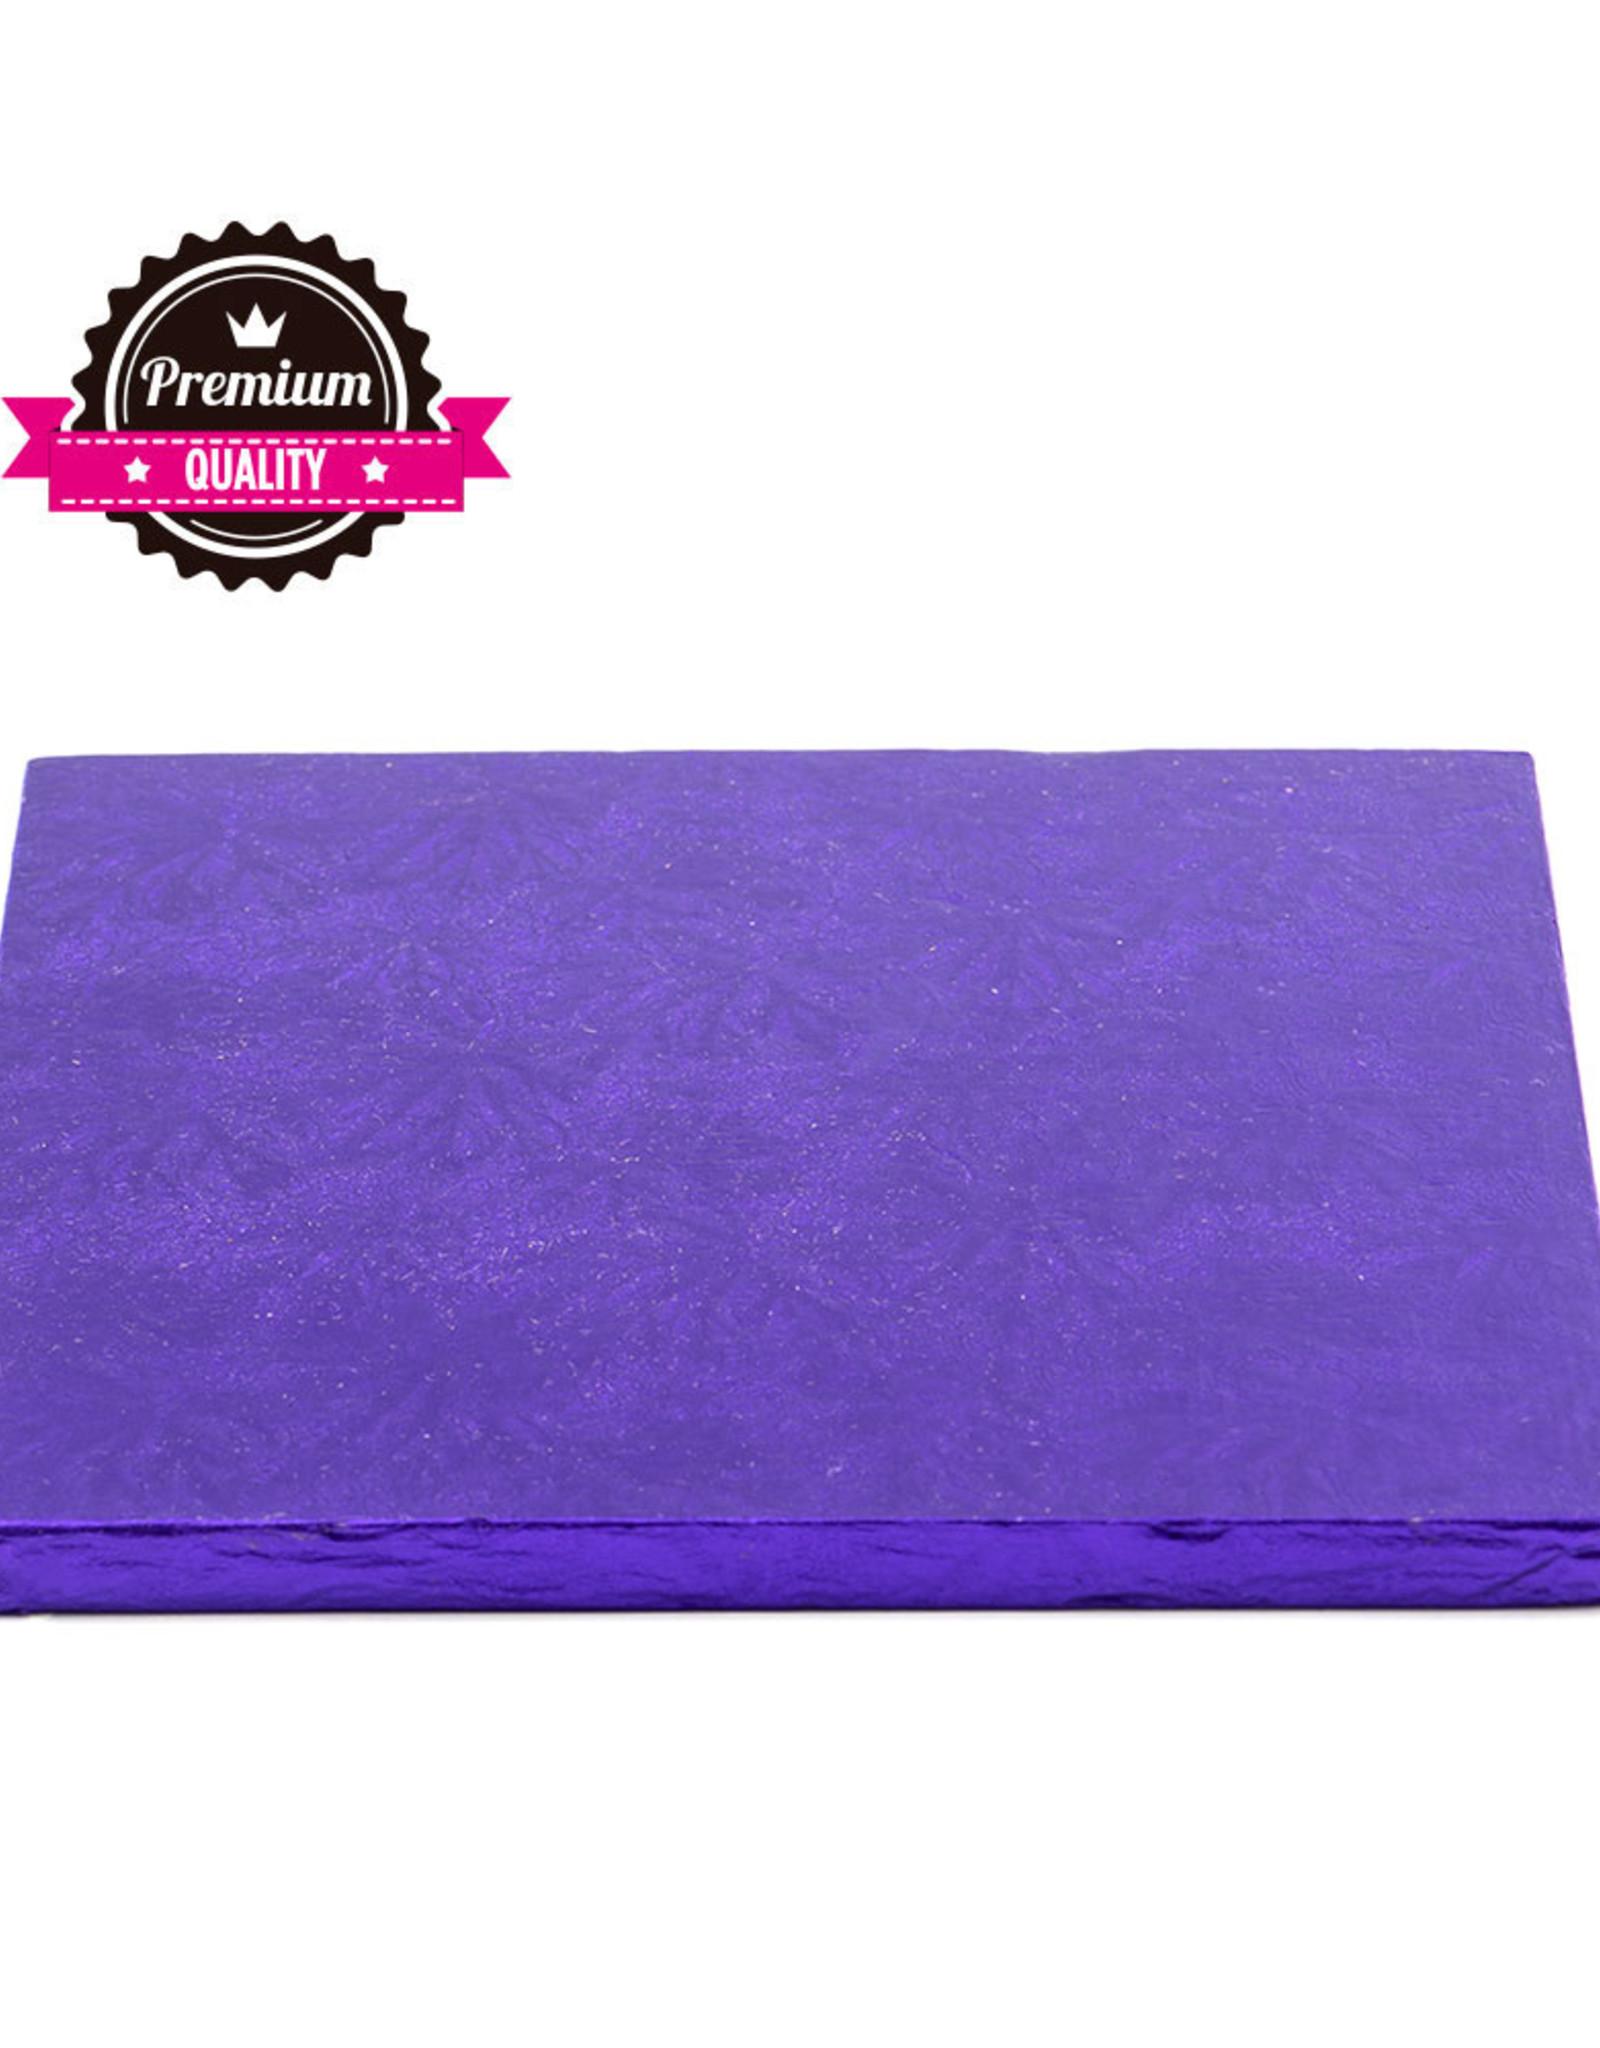 Decora Cake Drum Vierkant 25cm Violet